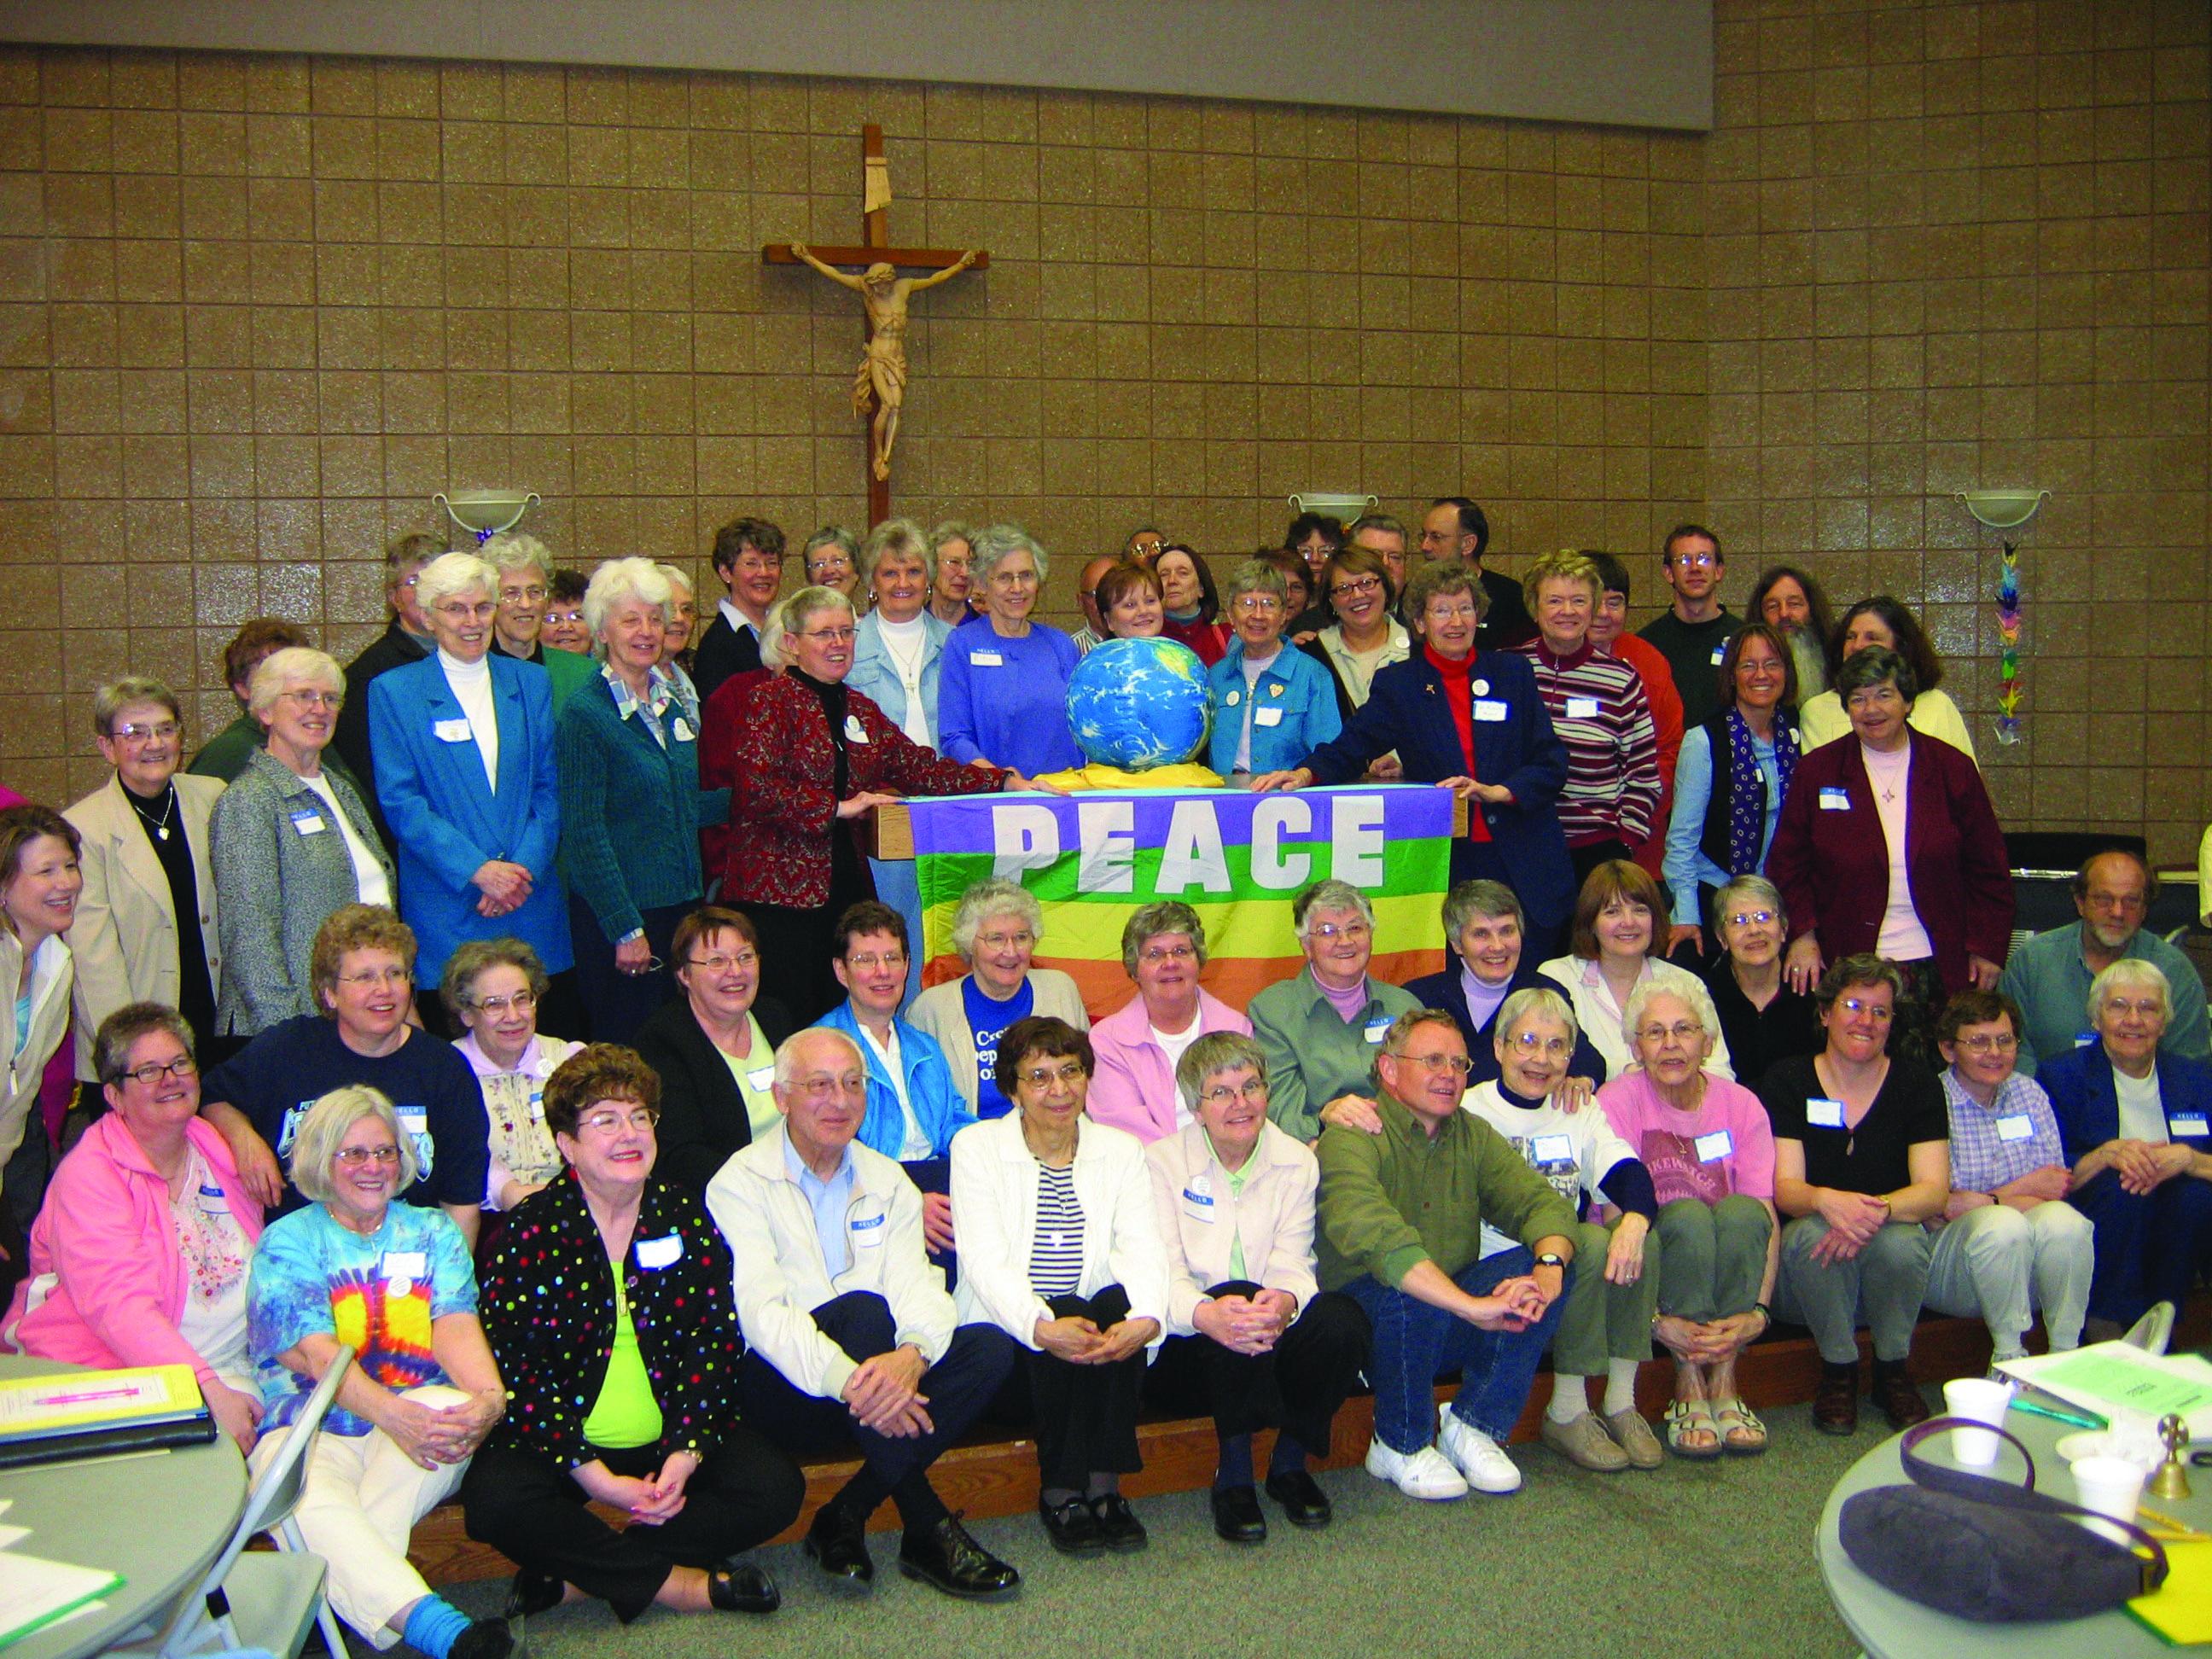 Pax Christi regional gathering